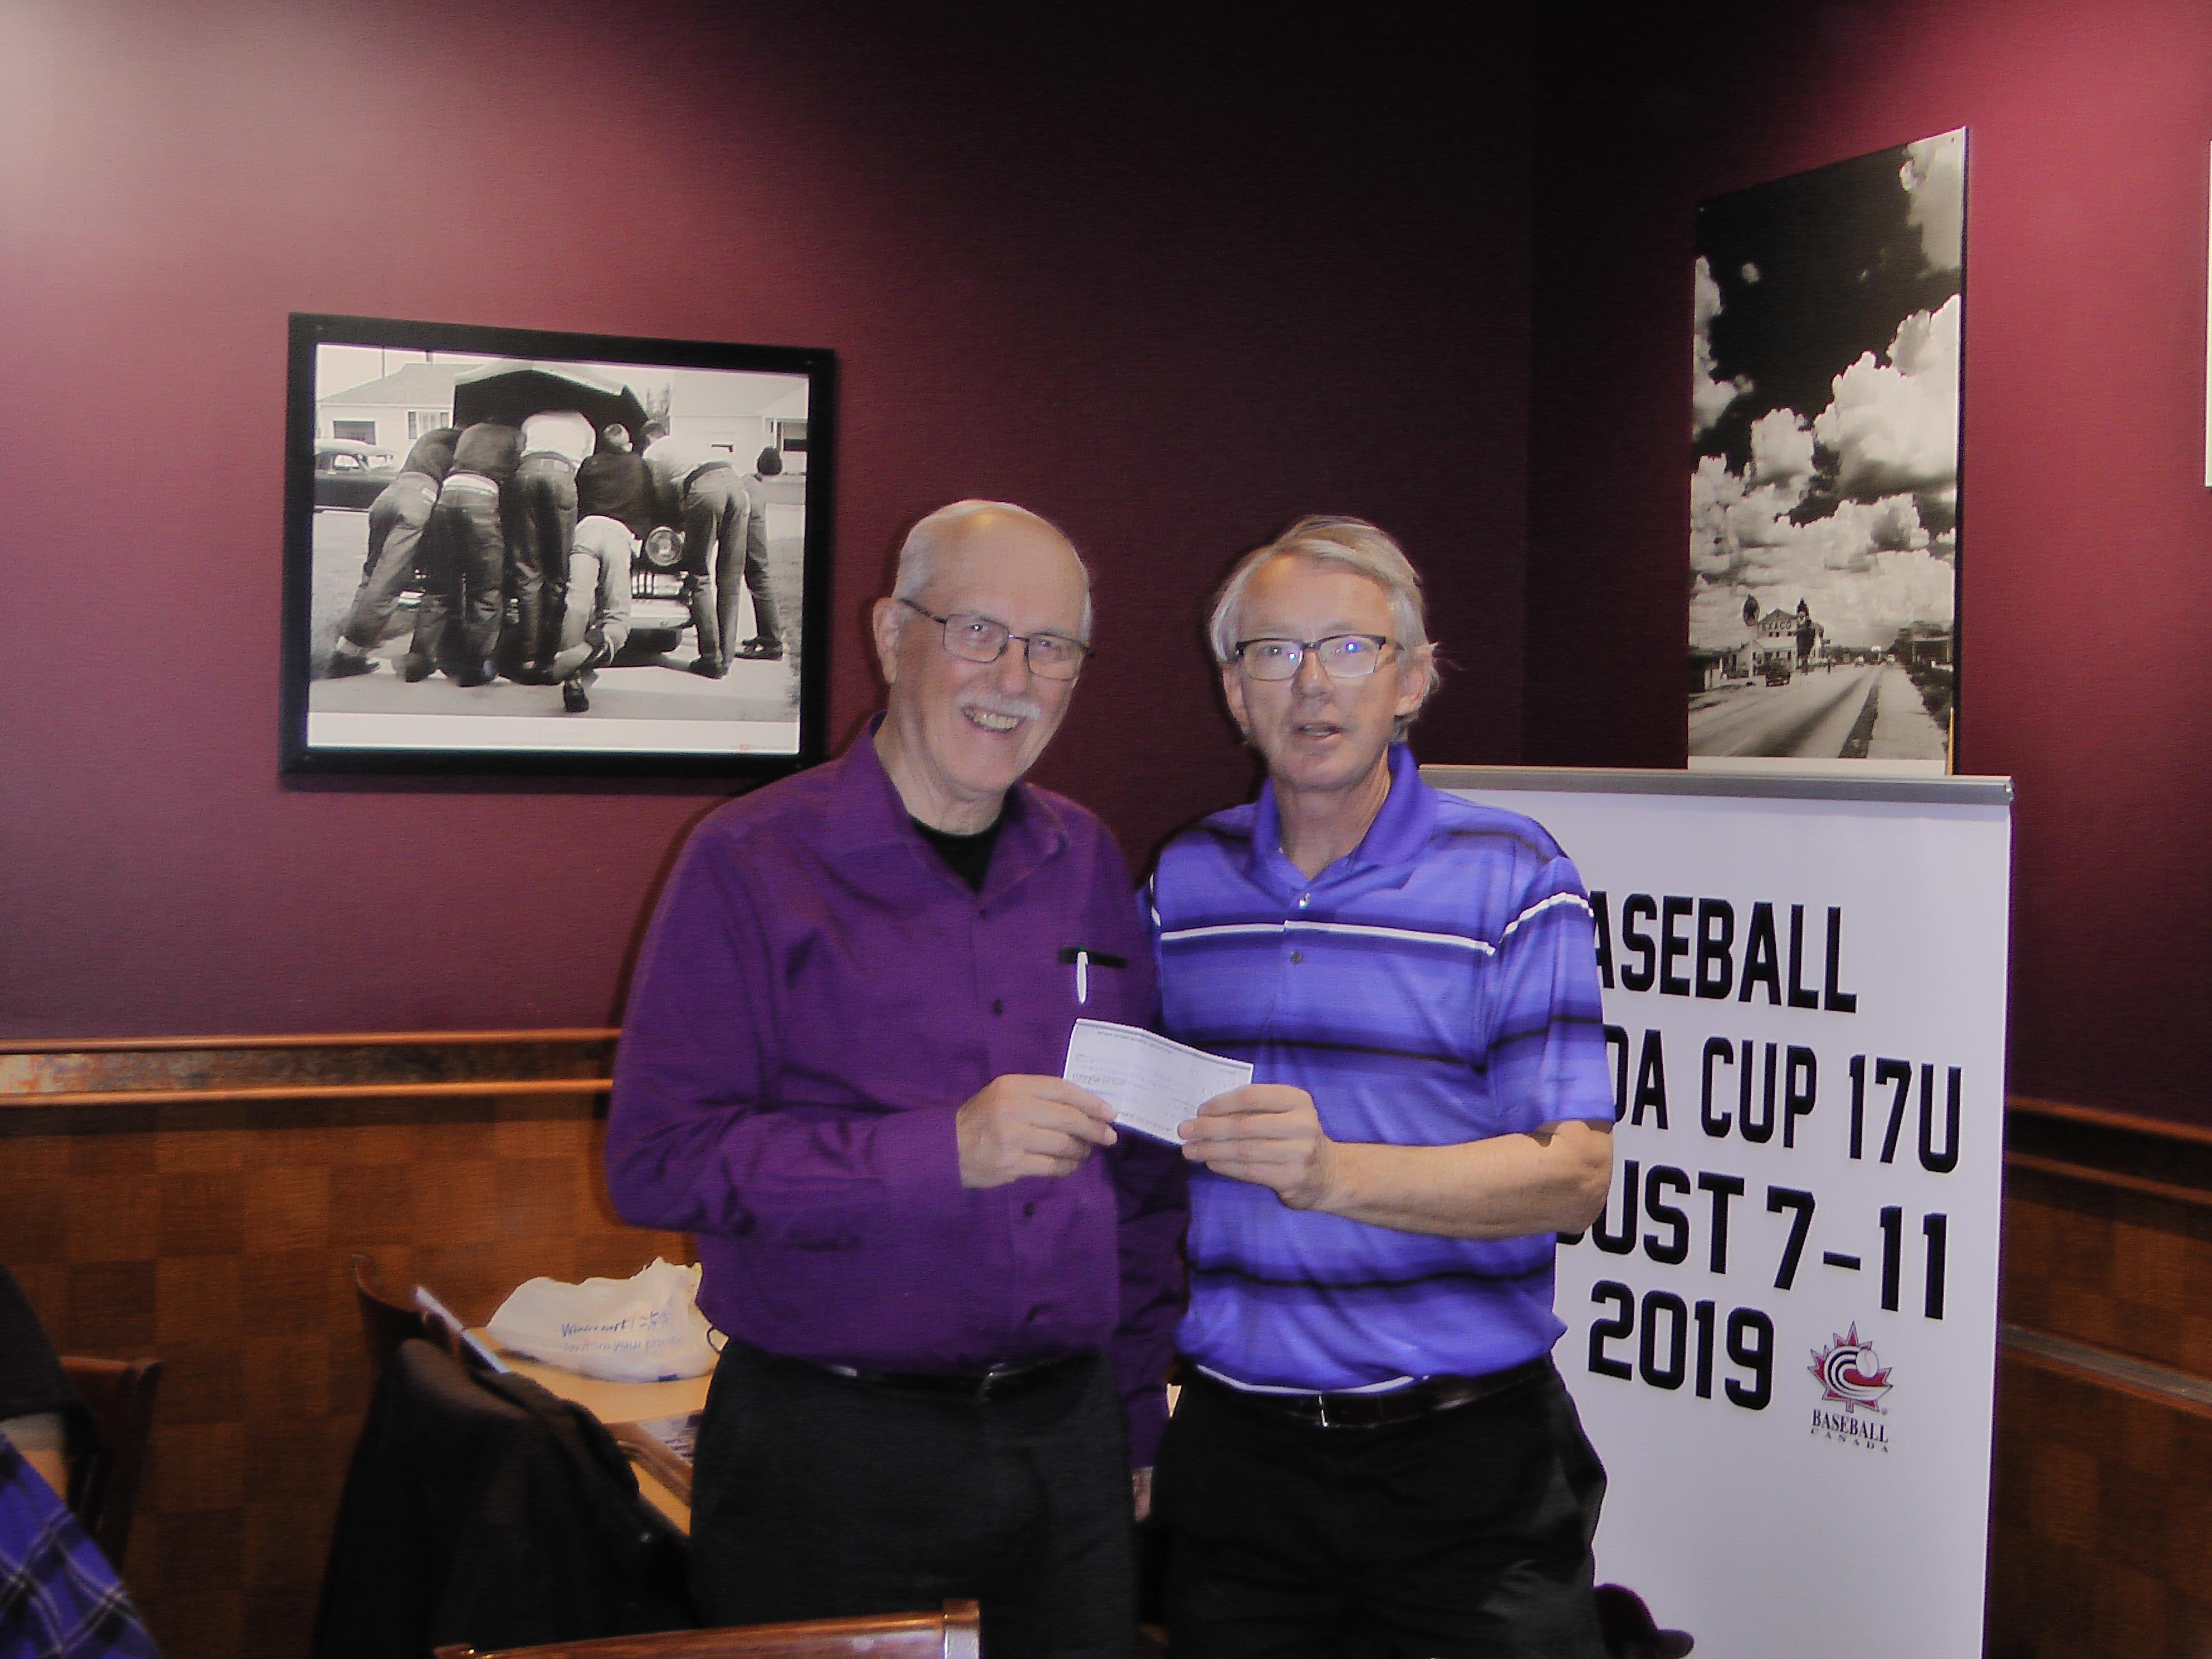 Awards Night Regina Optimist Baseball Association on Nov 26/18, held at Ricky's on Albert Street, at monthly Regina Optimist Club Meeting. - Image 8